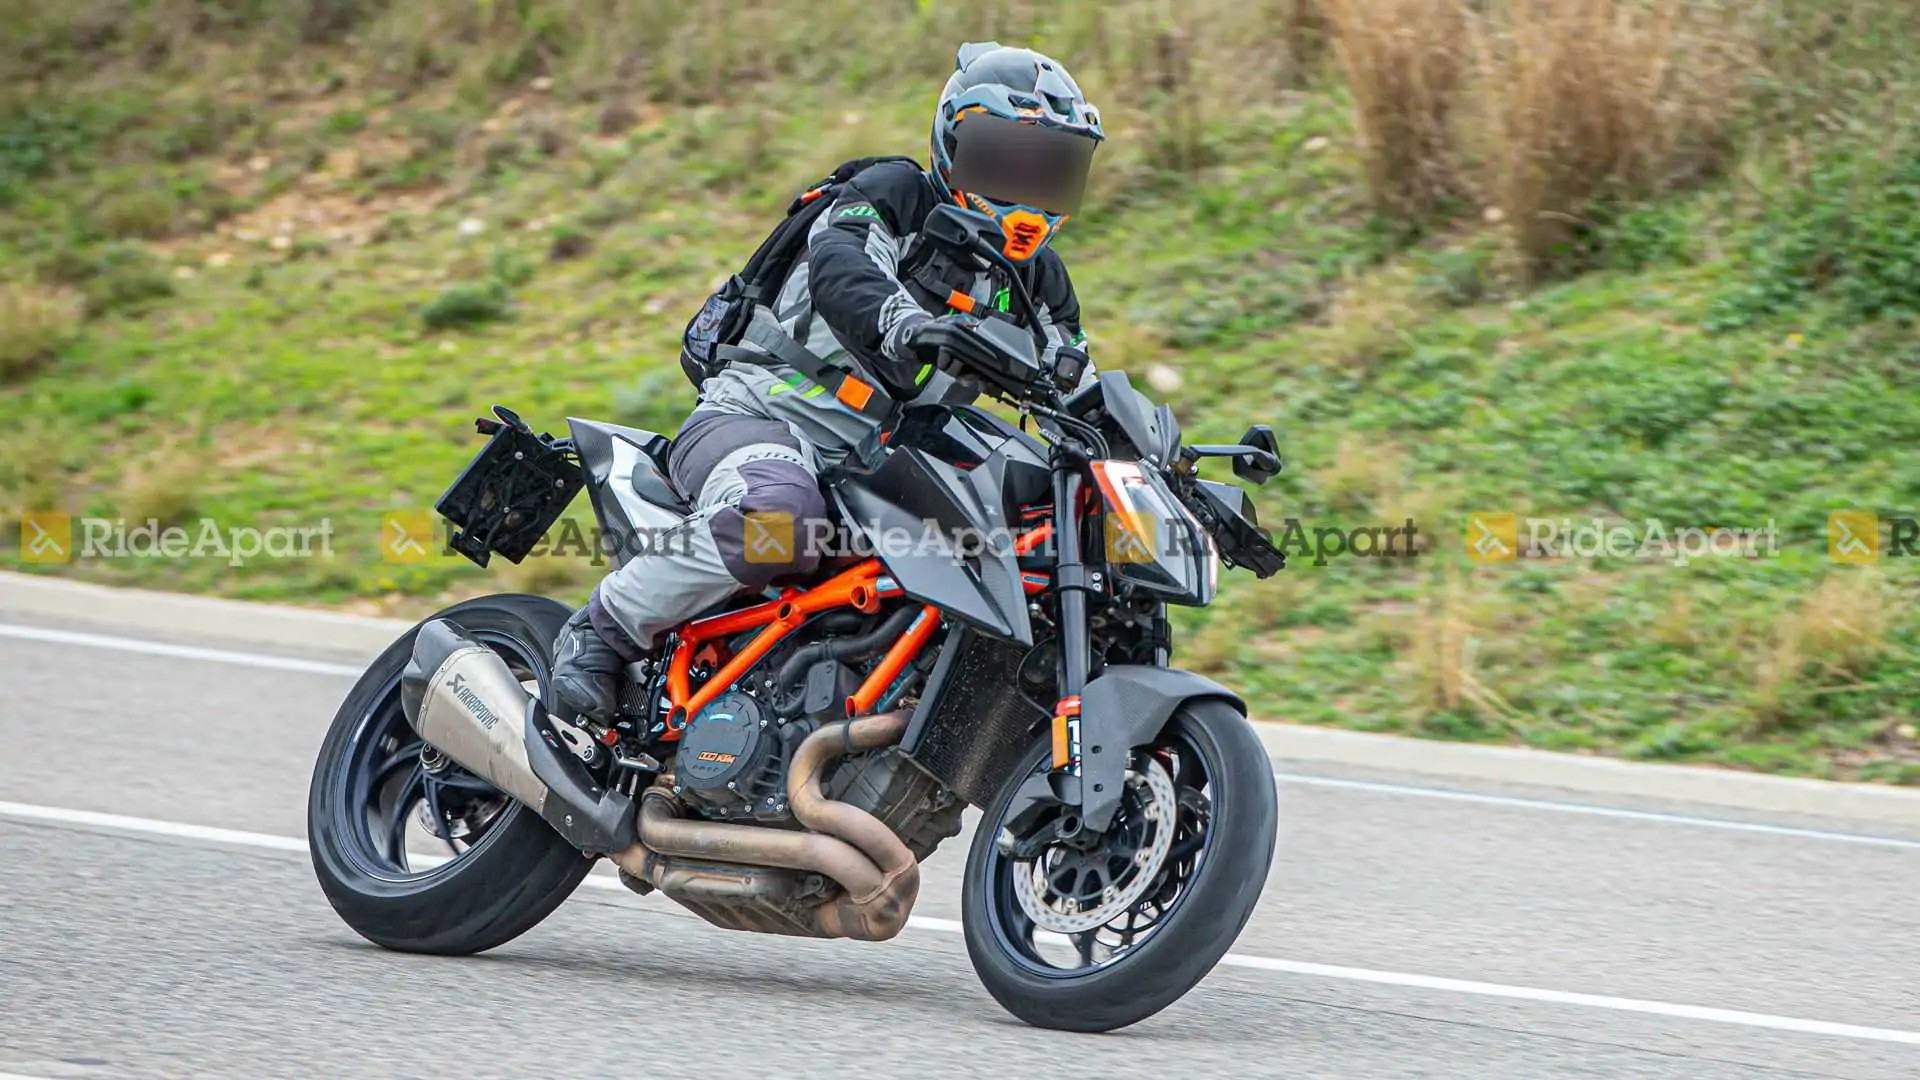 KTM 1290 Super Duke RR Spy Images